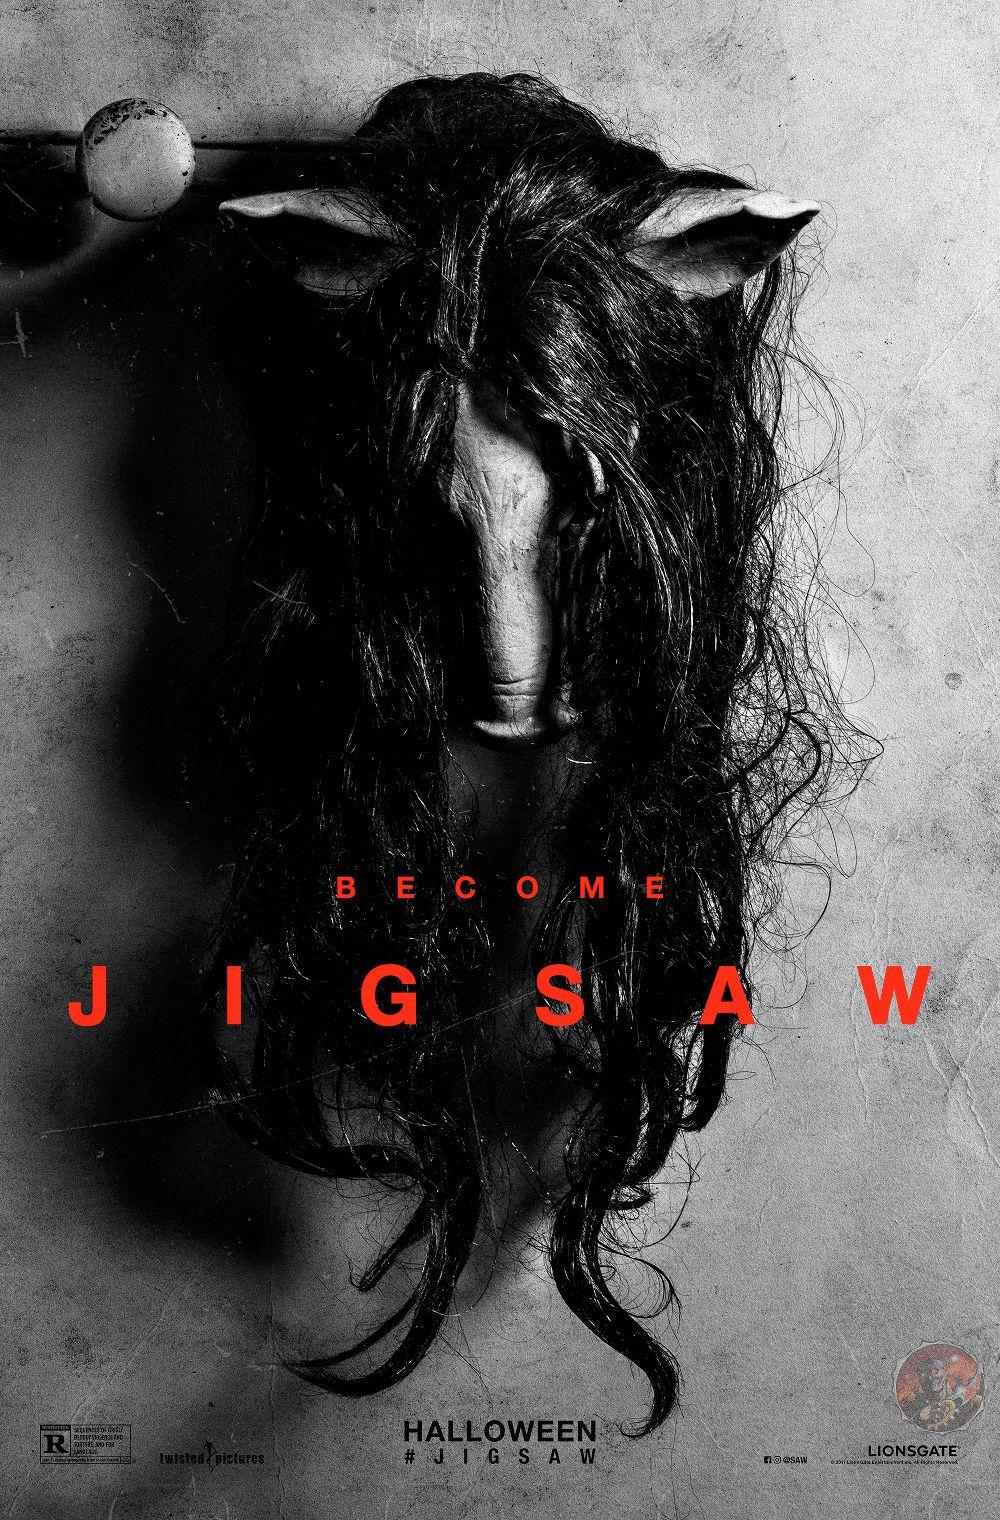 JIGSAW Halloween, 2017 Horrification and